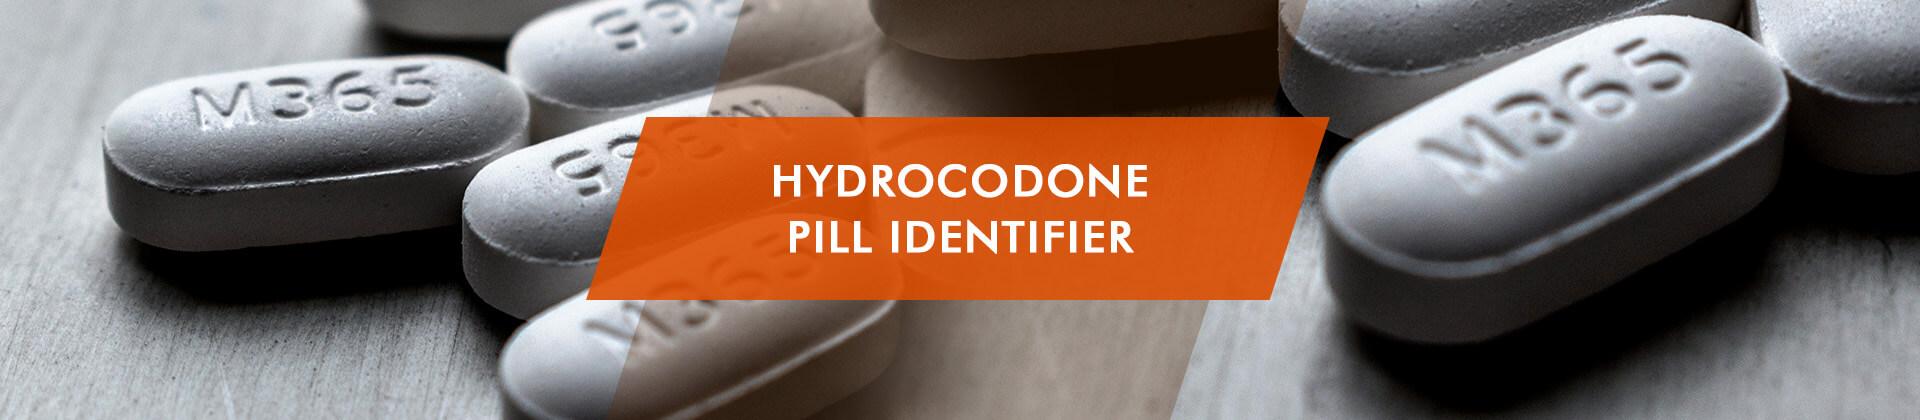 hydrocodone pill identification